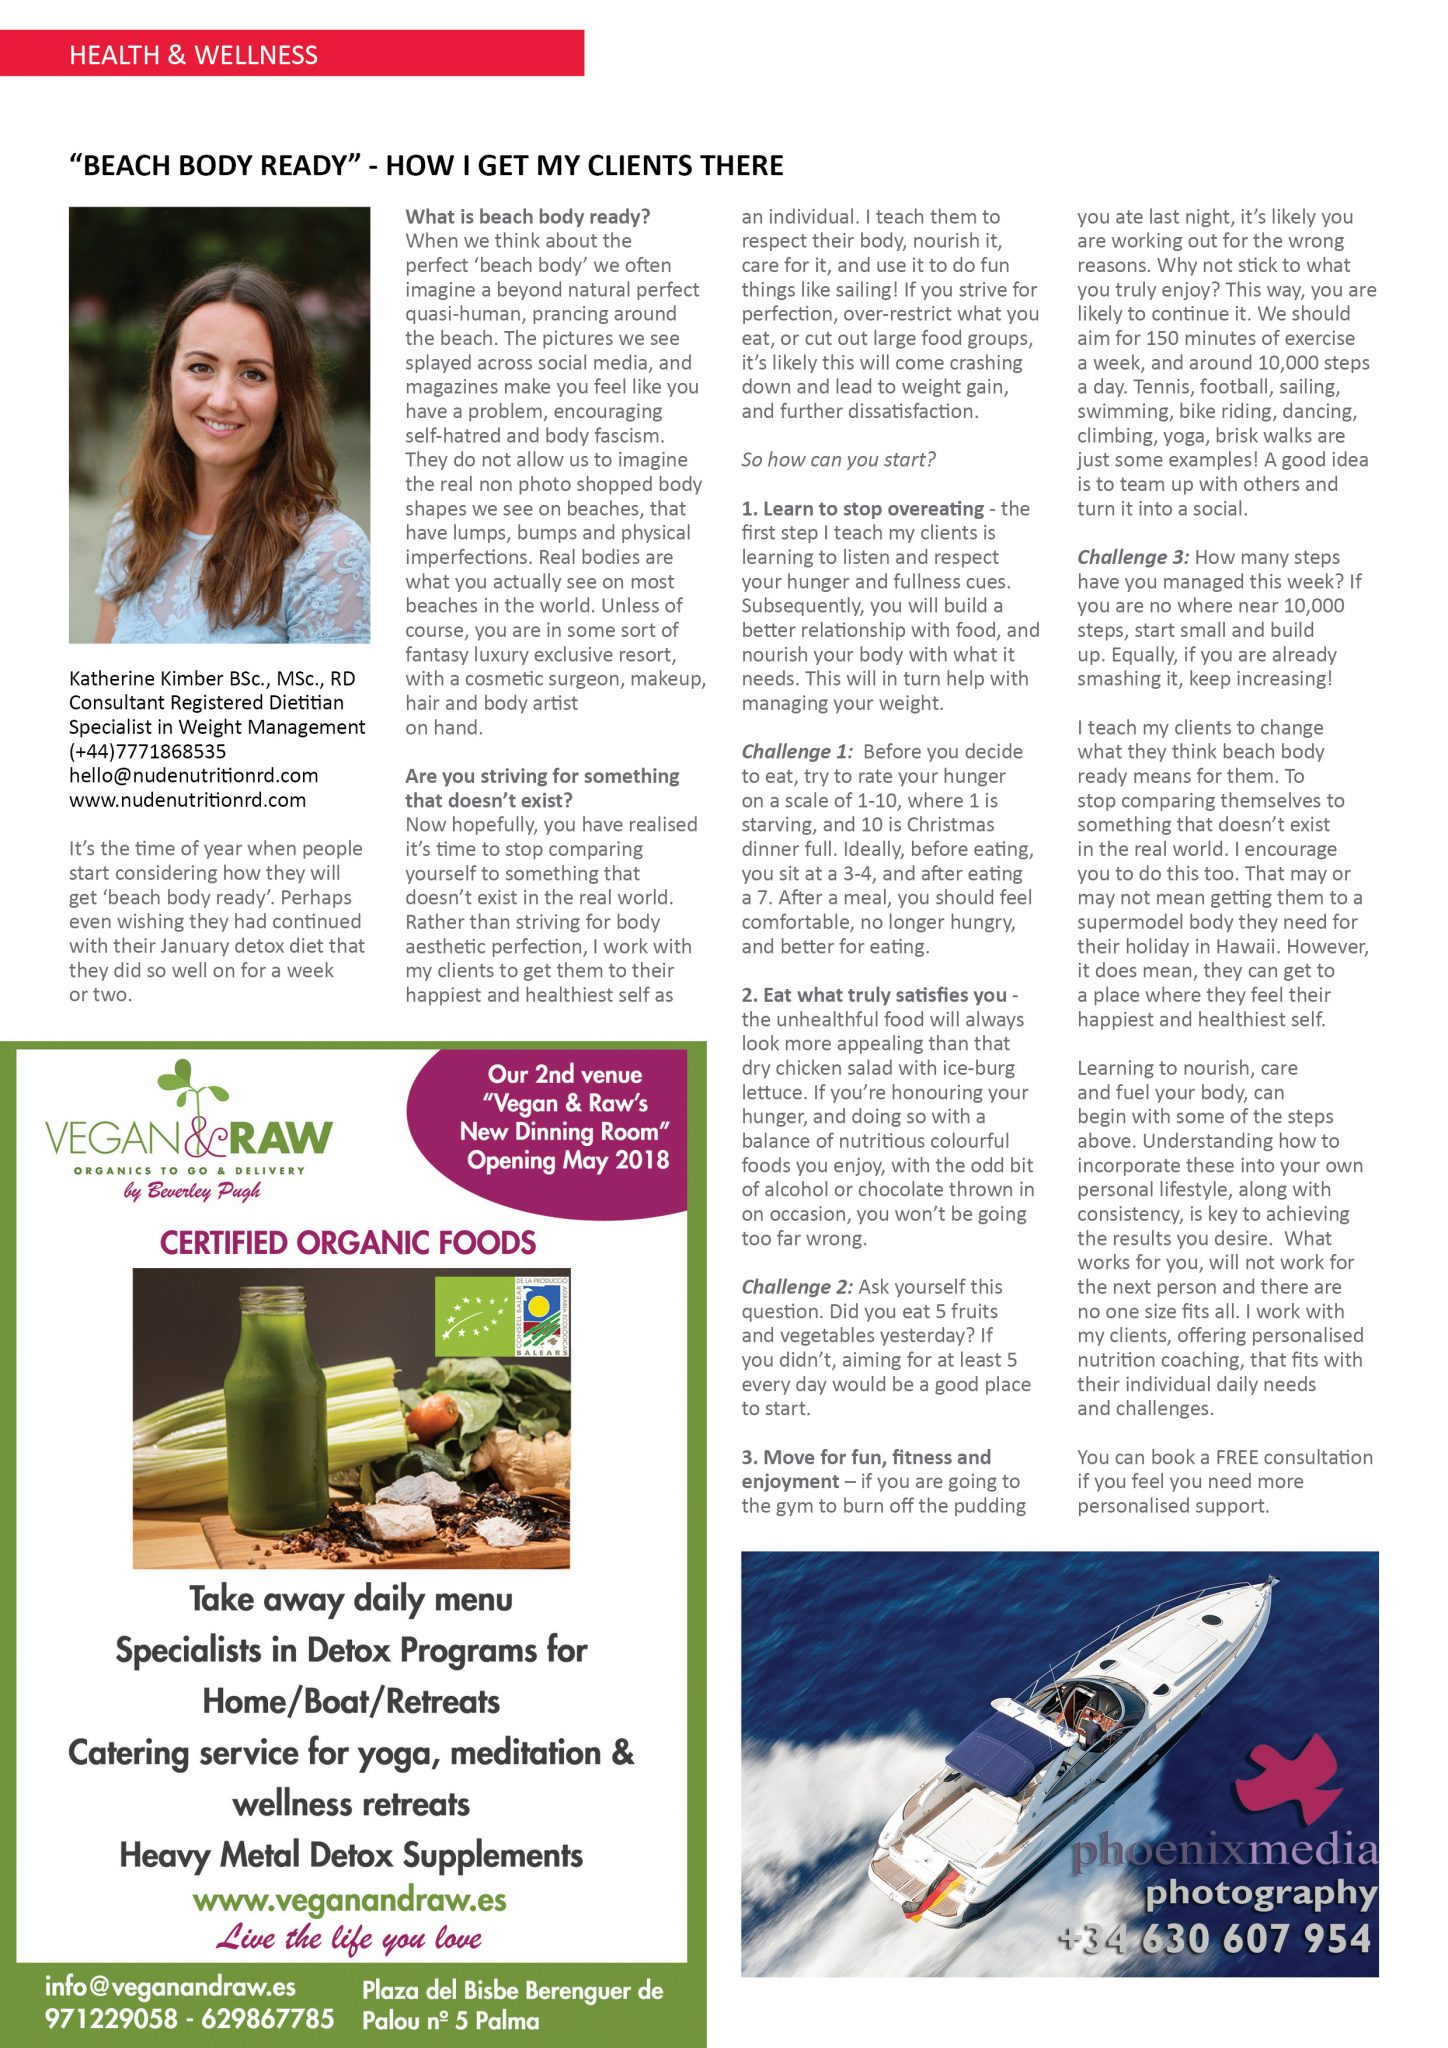 The Islander Magazine, Beach Body Ready